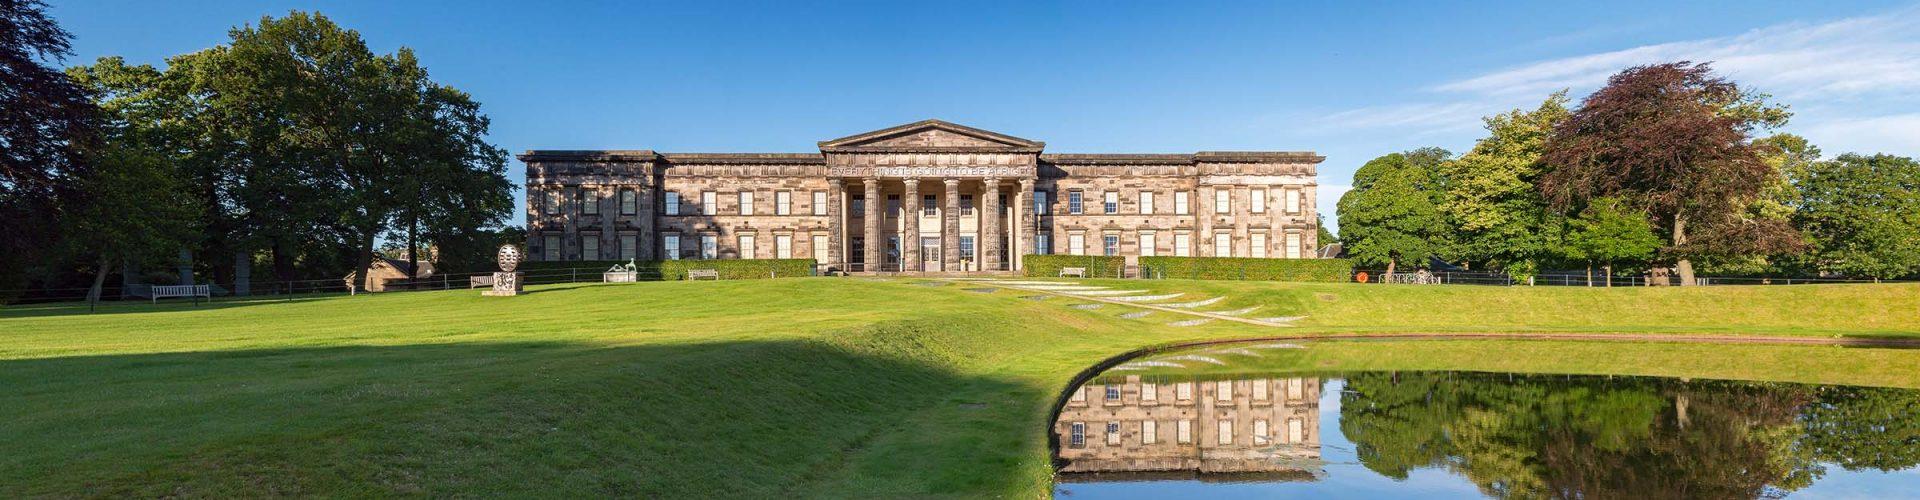 The Scottish Gallery of Modern Art in Edinburgh